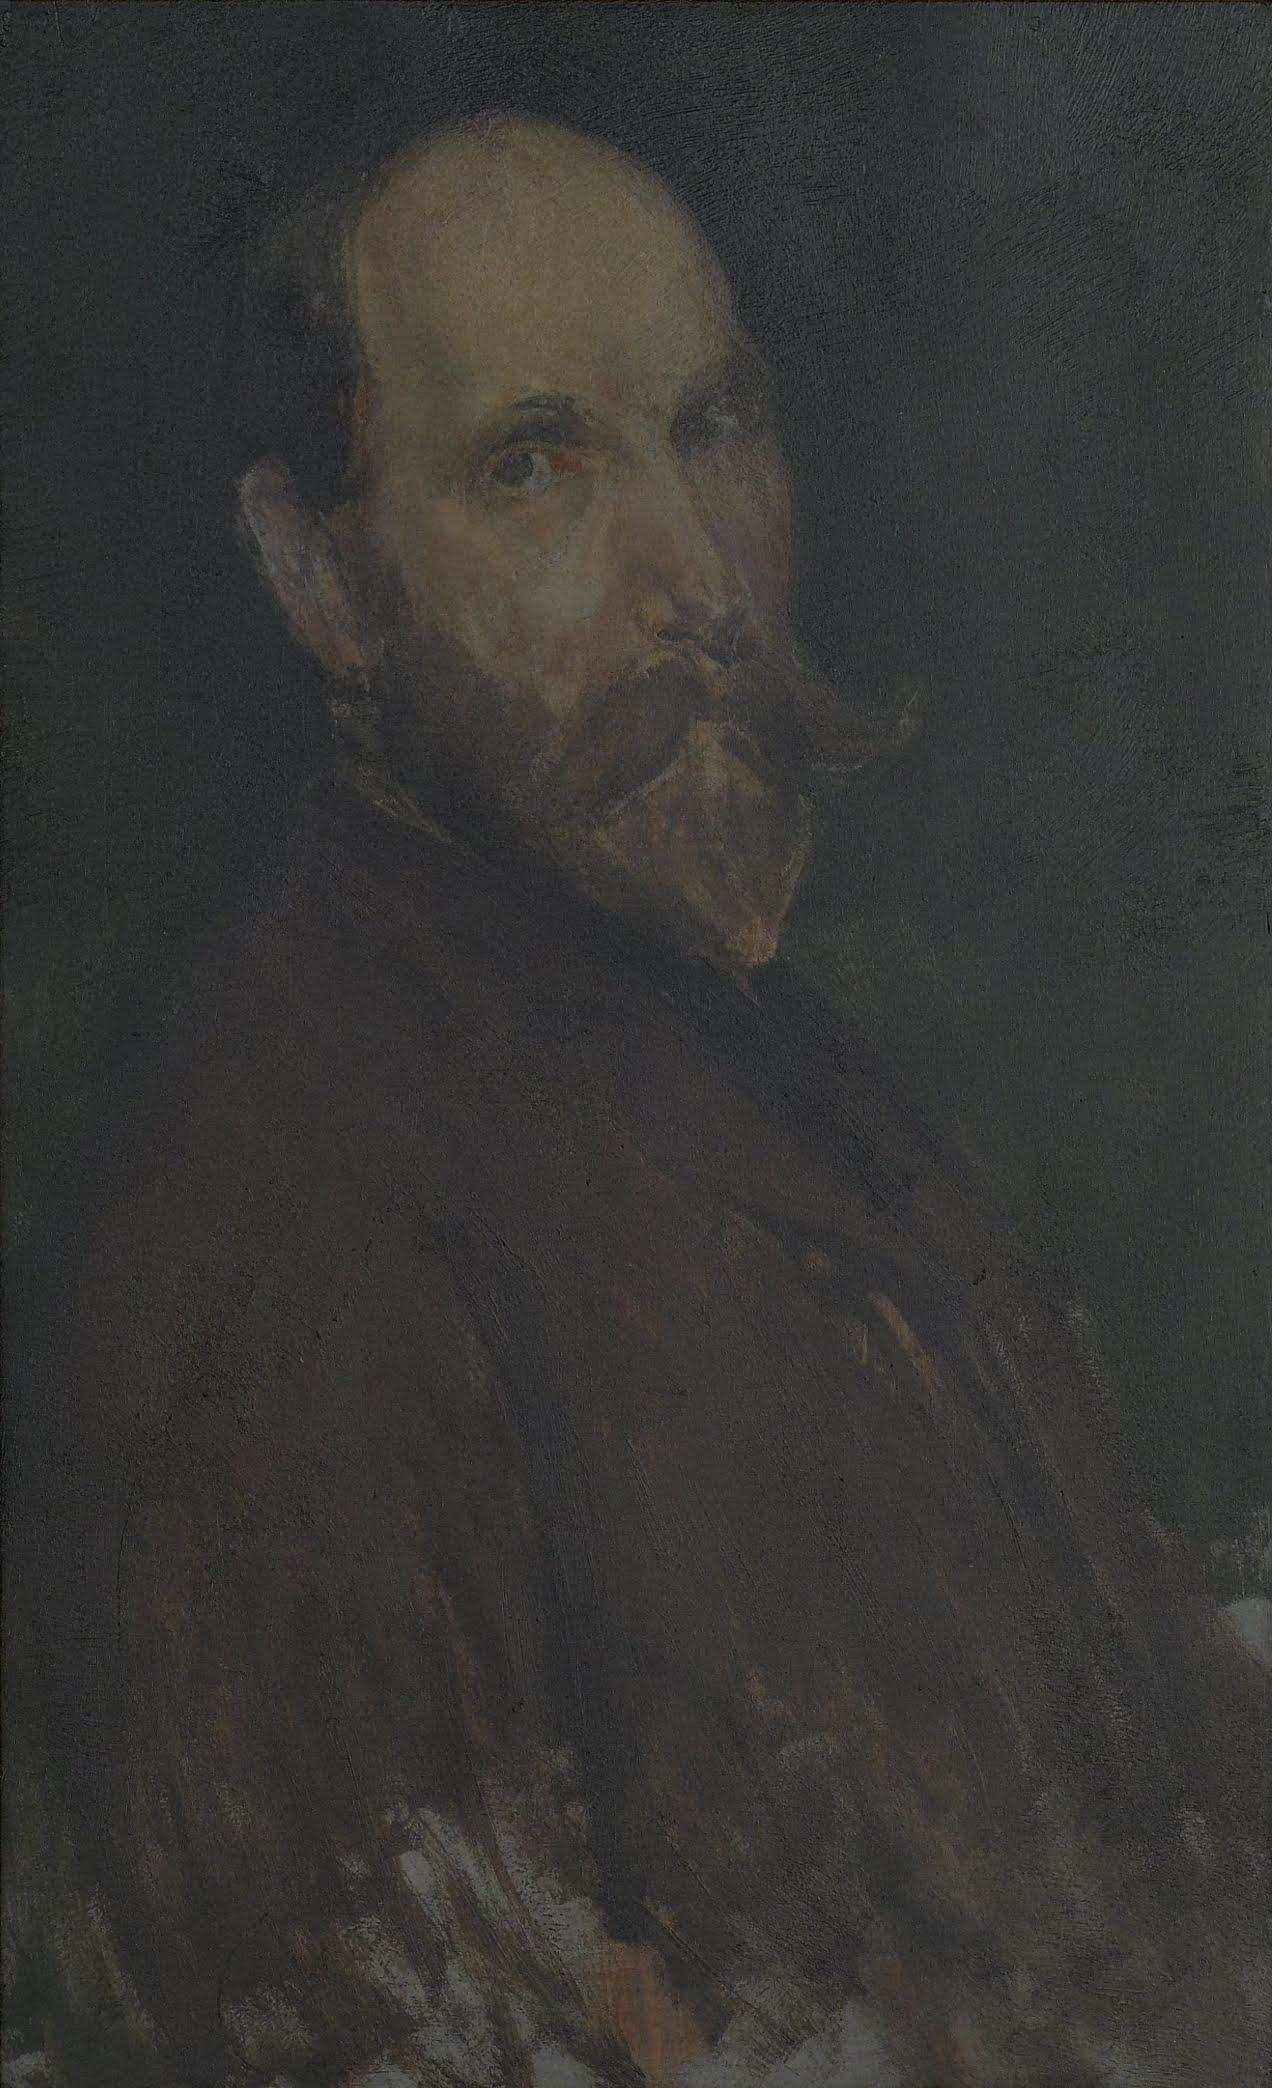 Charles Lang Freer FileJames McNeill Whistler 18541903 Portrait of